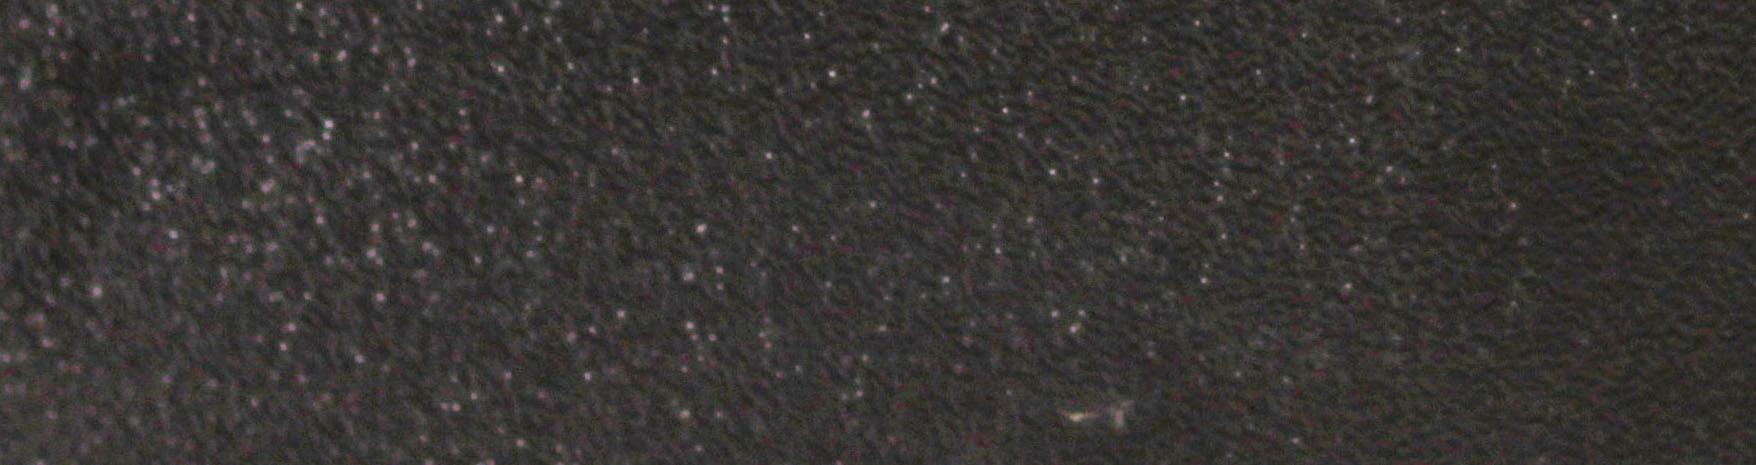 999 -  BLACK  22 x 2 mm